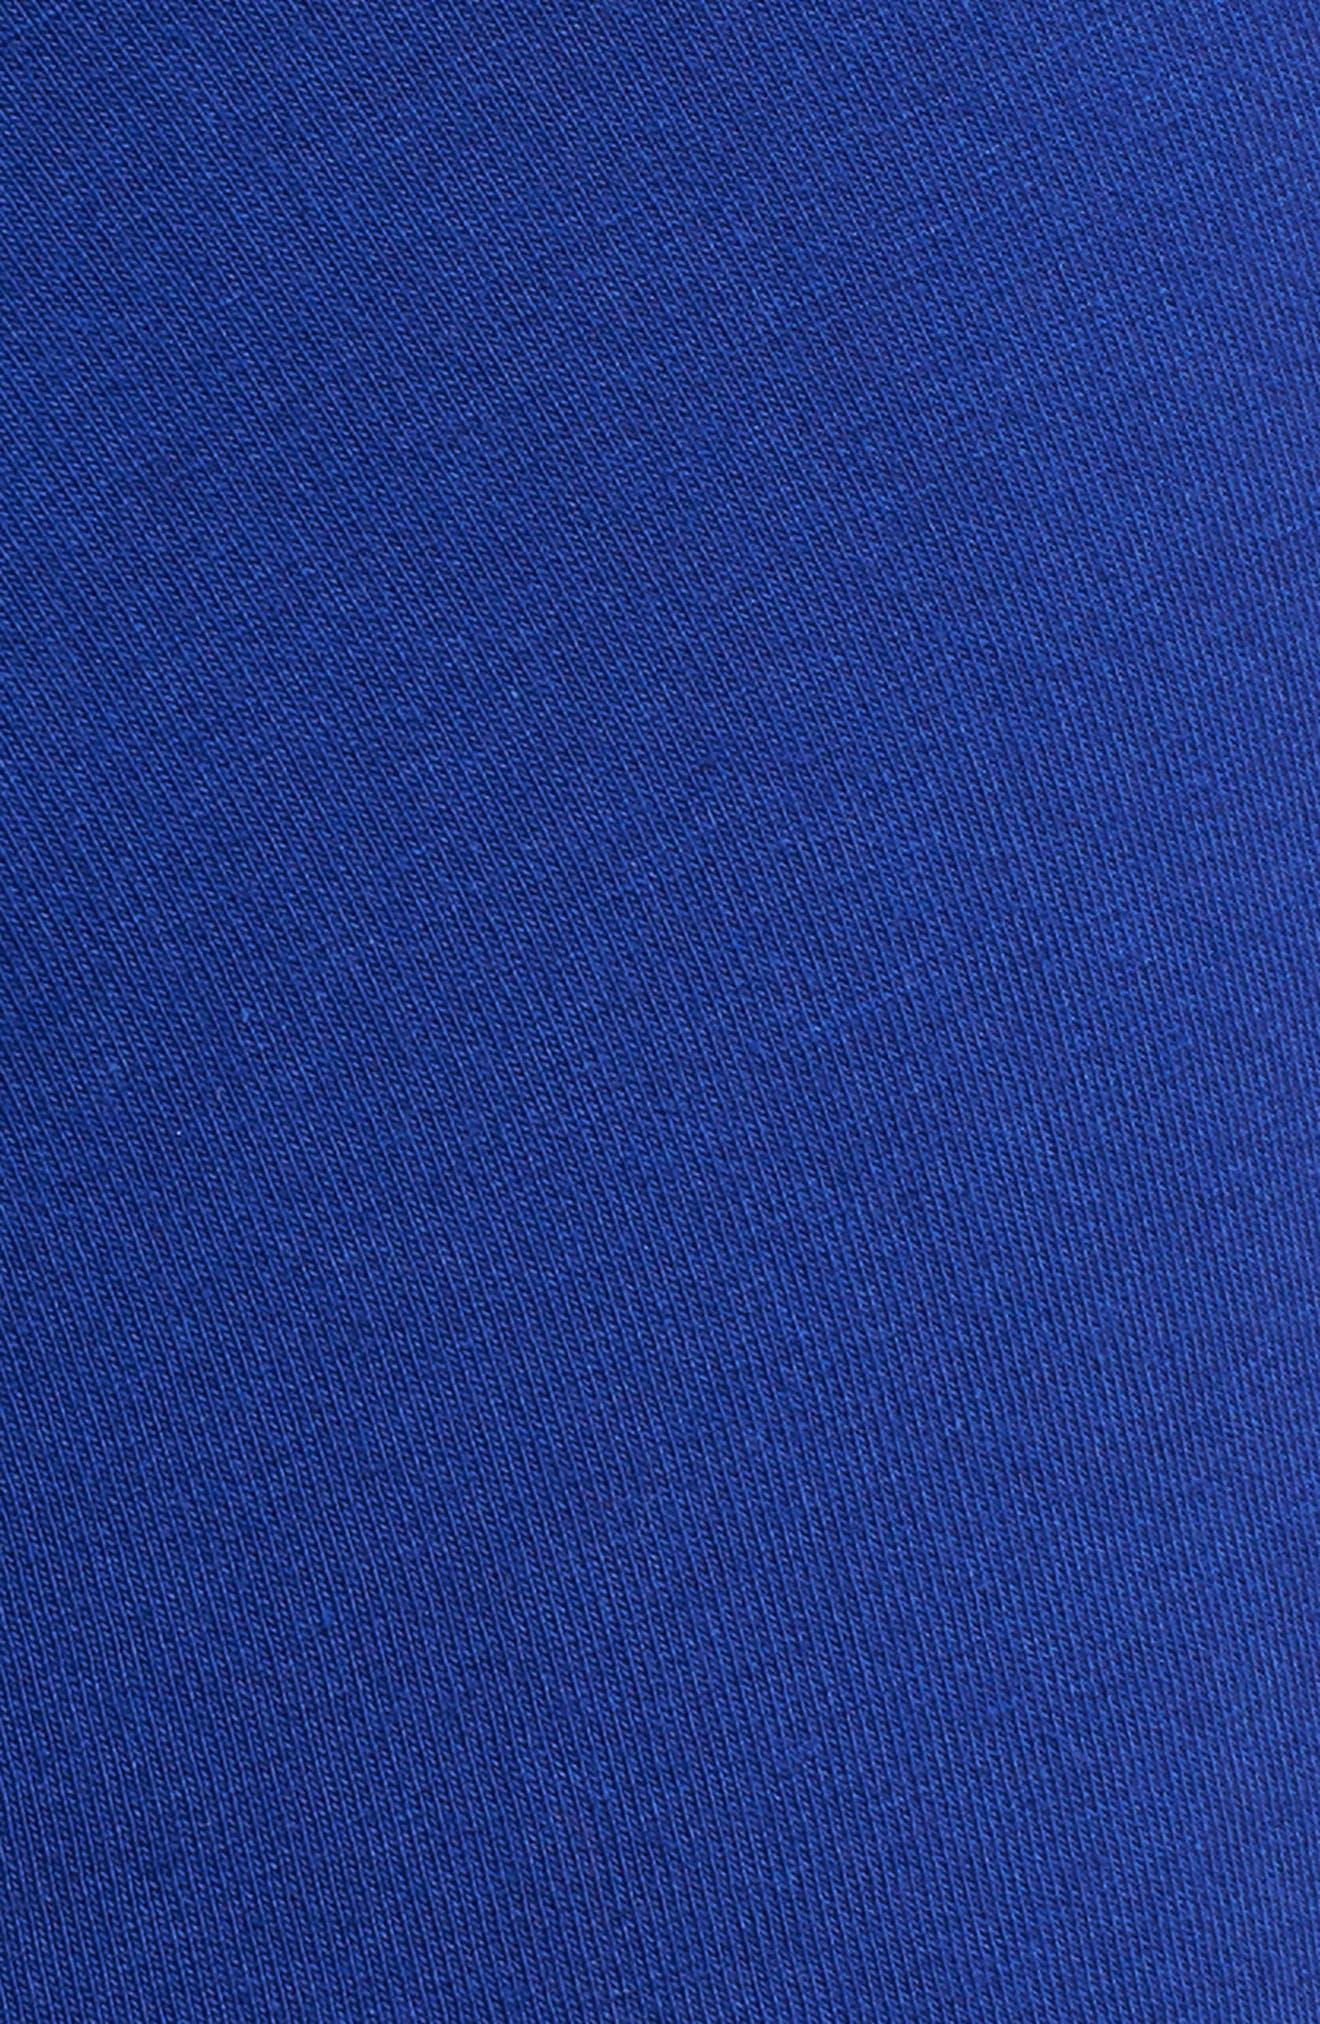 Versace Collection Low Rise Trunks,                             Alternate thumbnail 5, color,                             Bluette/ Gold